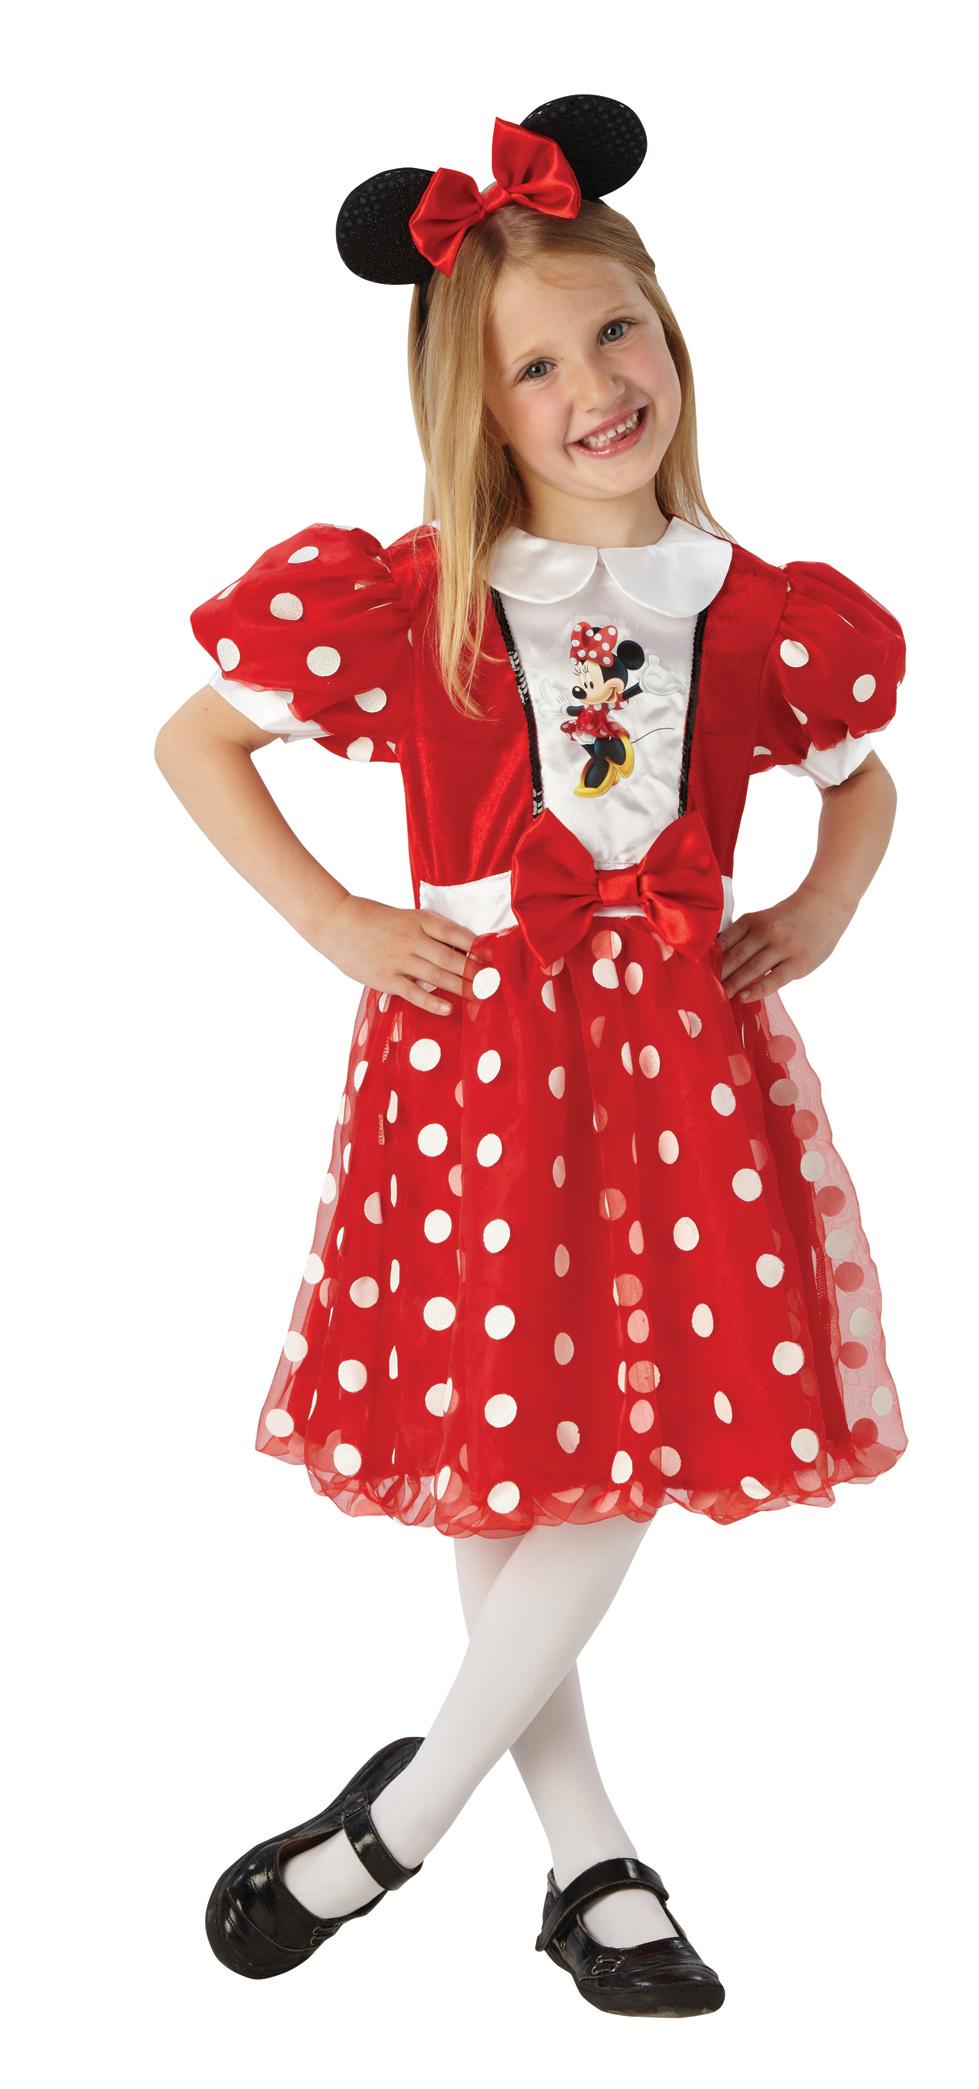 Minnie Mouse Maus LIZENZ Kostüme Mädchen rot-glitzer + Strumpfhose